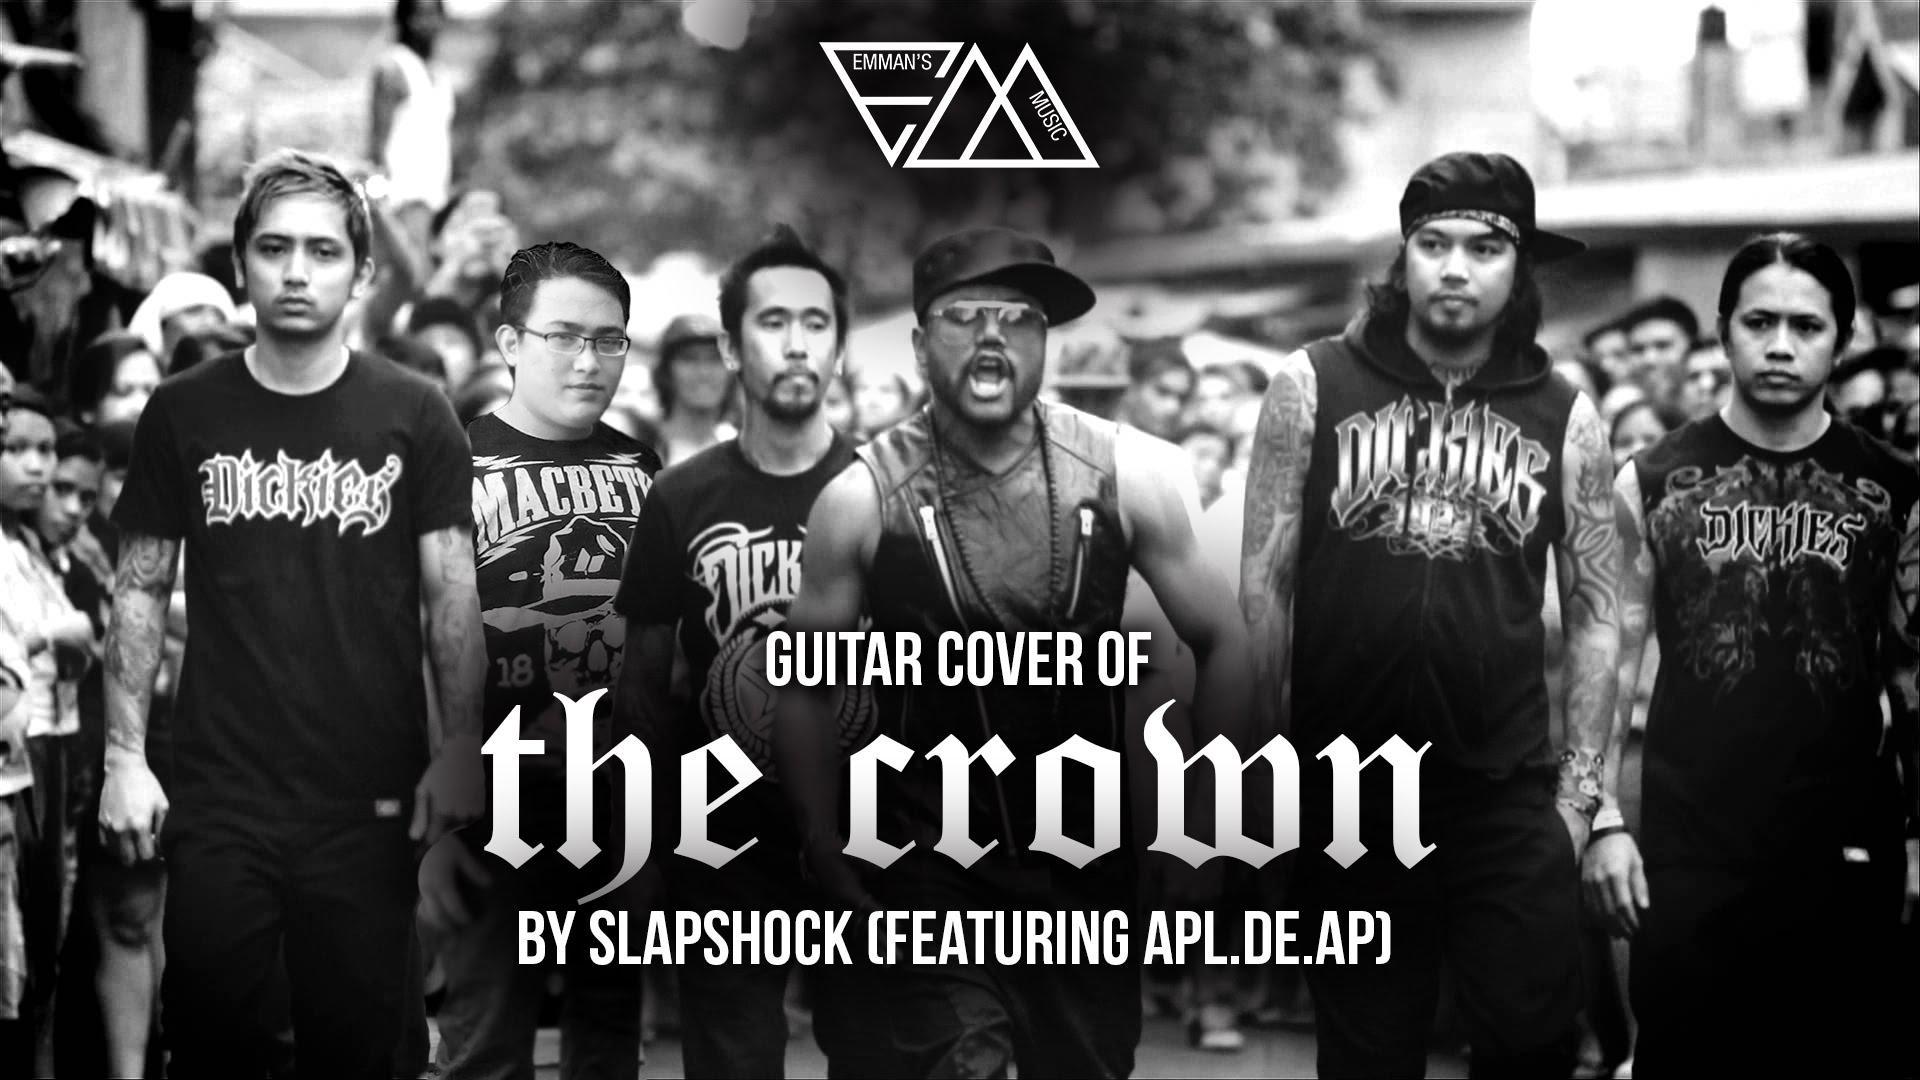 Slapshock wallpaper free download (40 Wallpapers) – Adorable